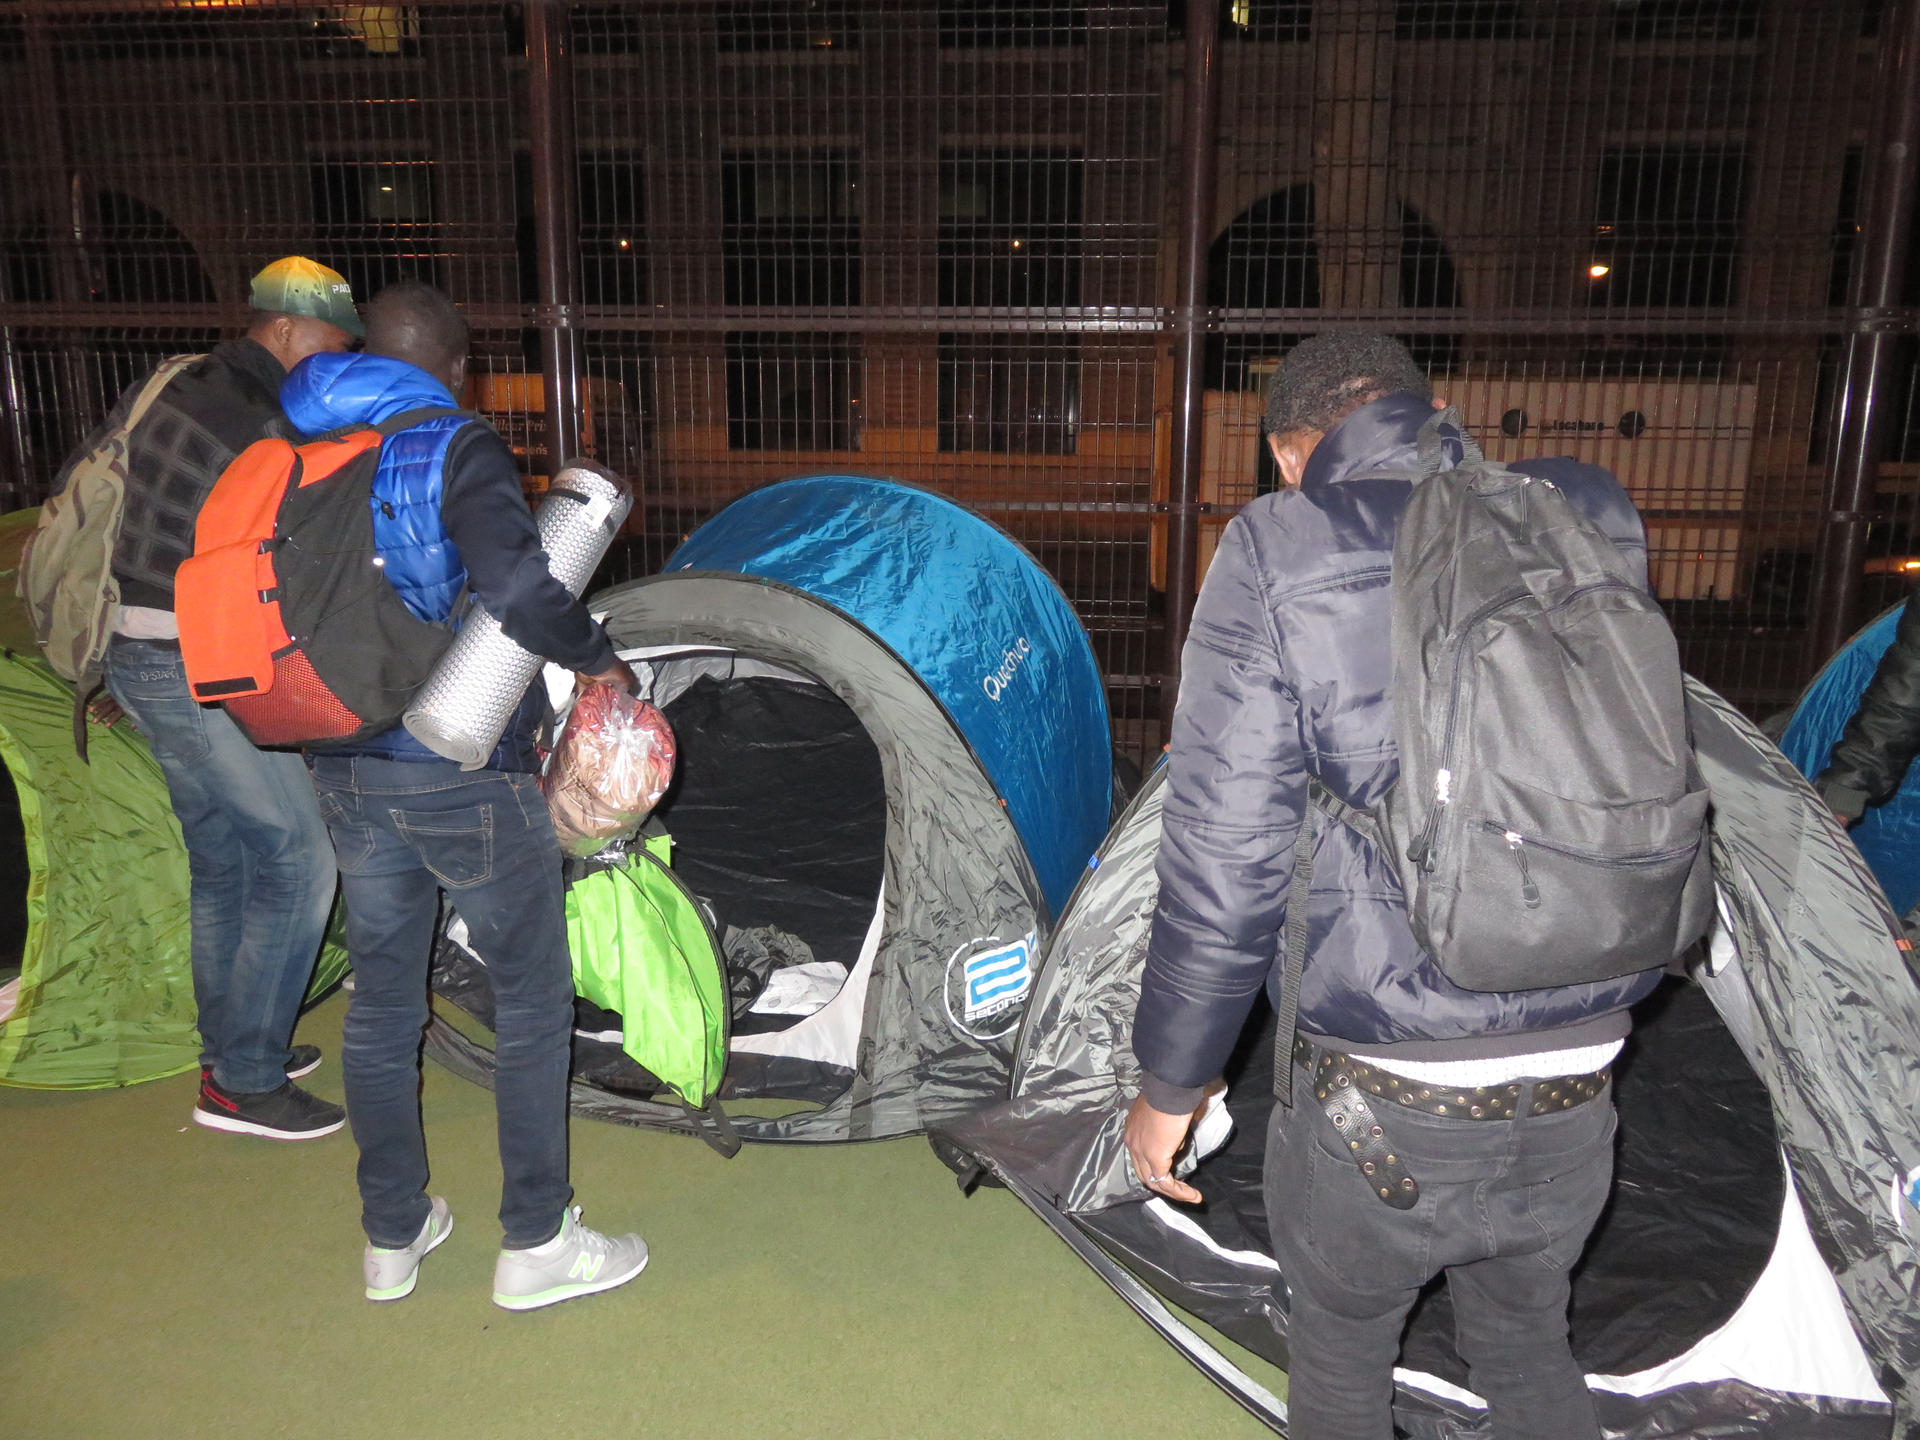 Jeunes migrants dans des campements